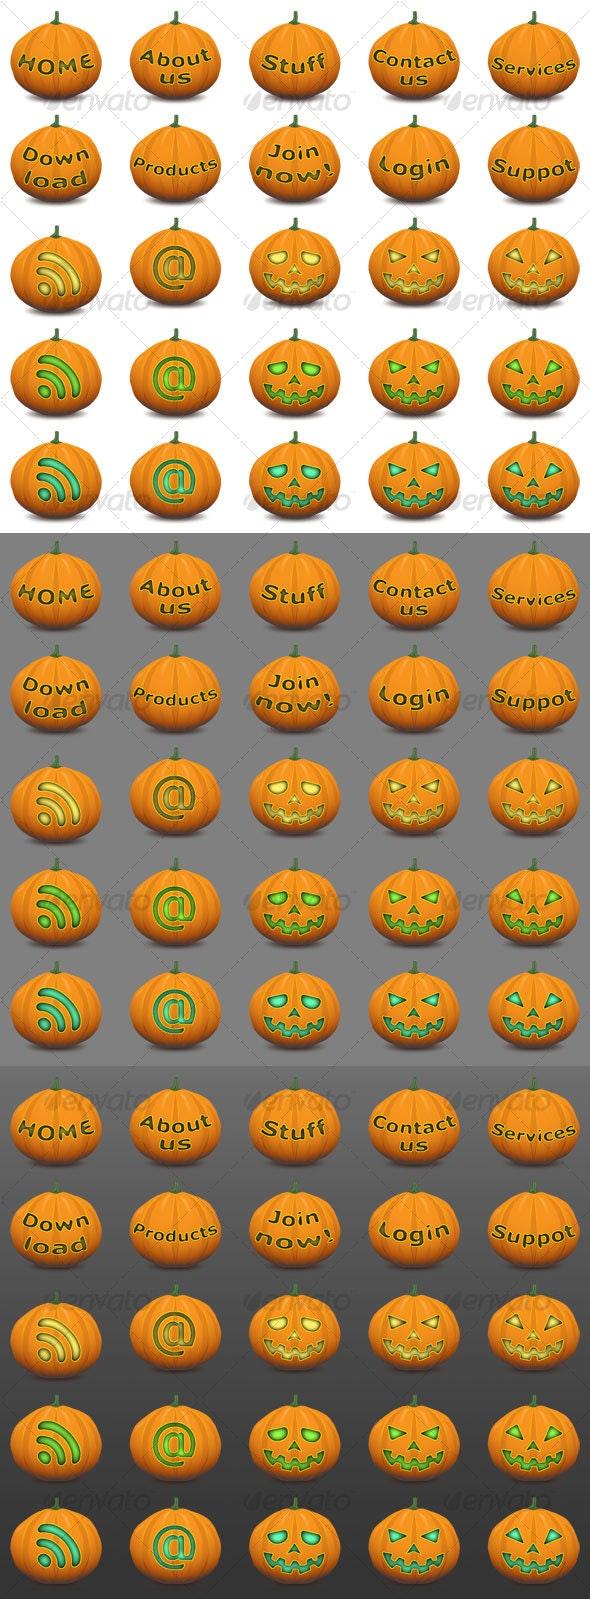 Pumpkins 2009 - Halloween Seasons/Holidays